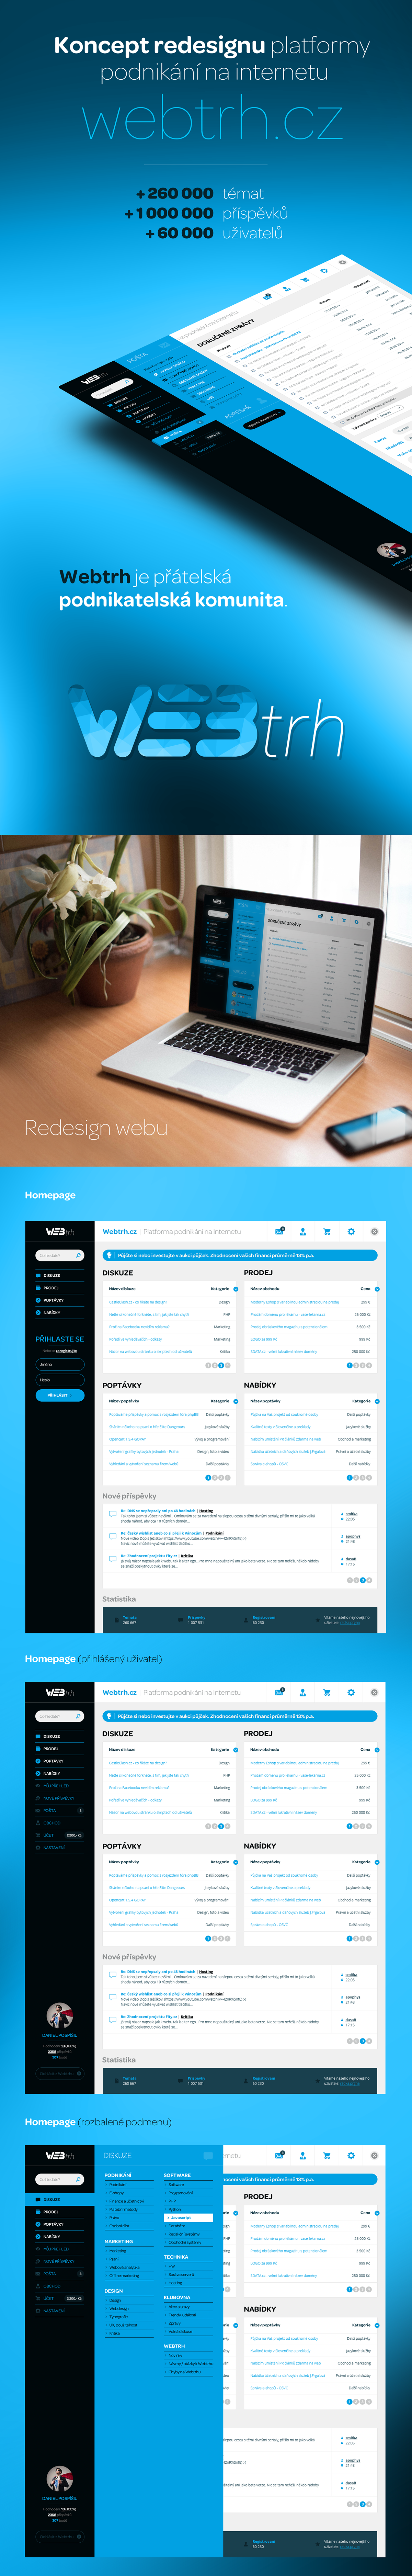 webtrh phpbb diskuze forum redesign koncept dashboard concept UI